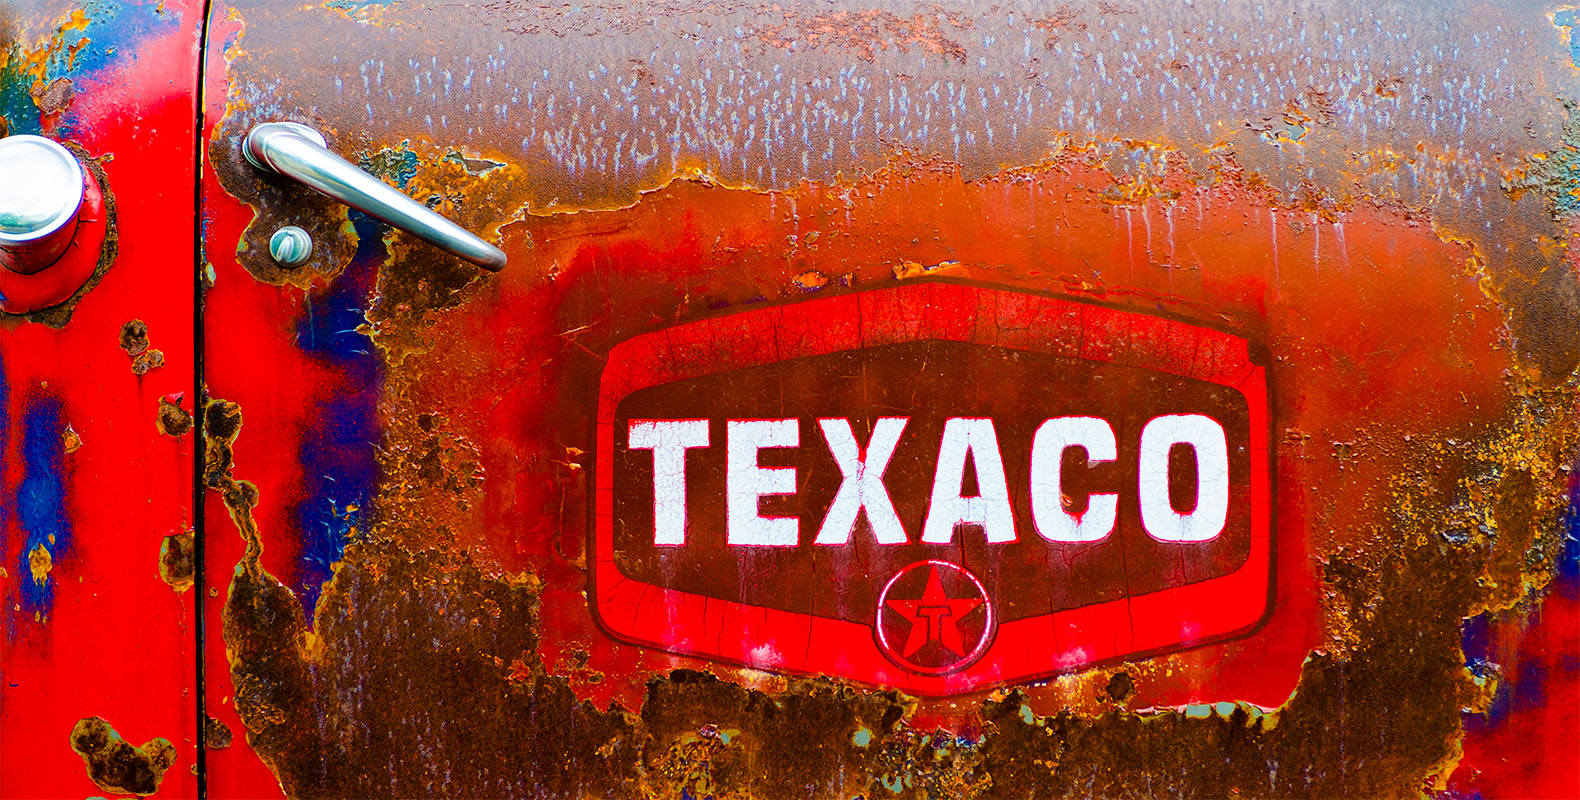 vintage texaco truck